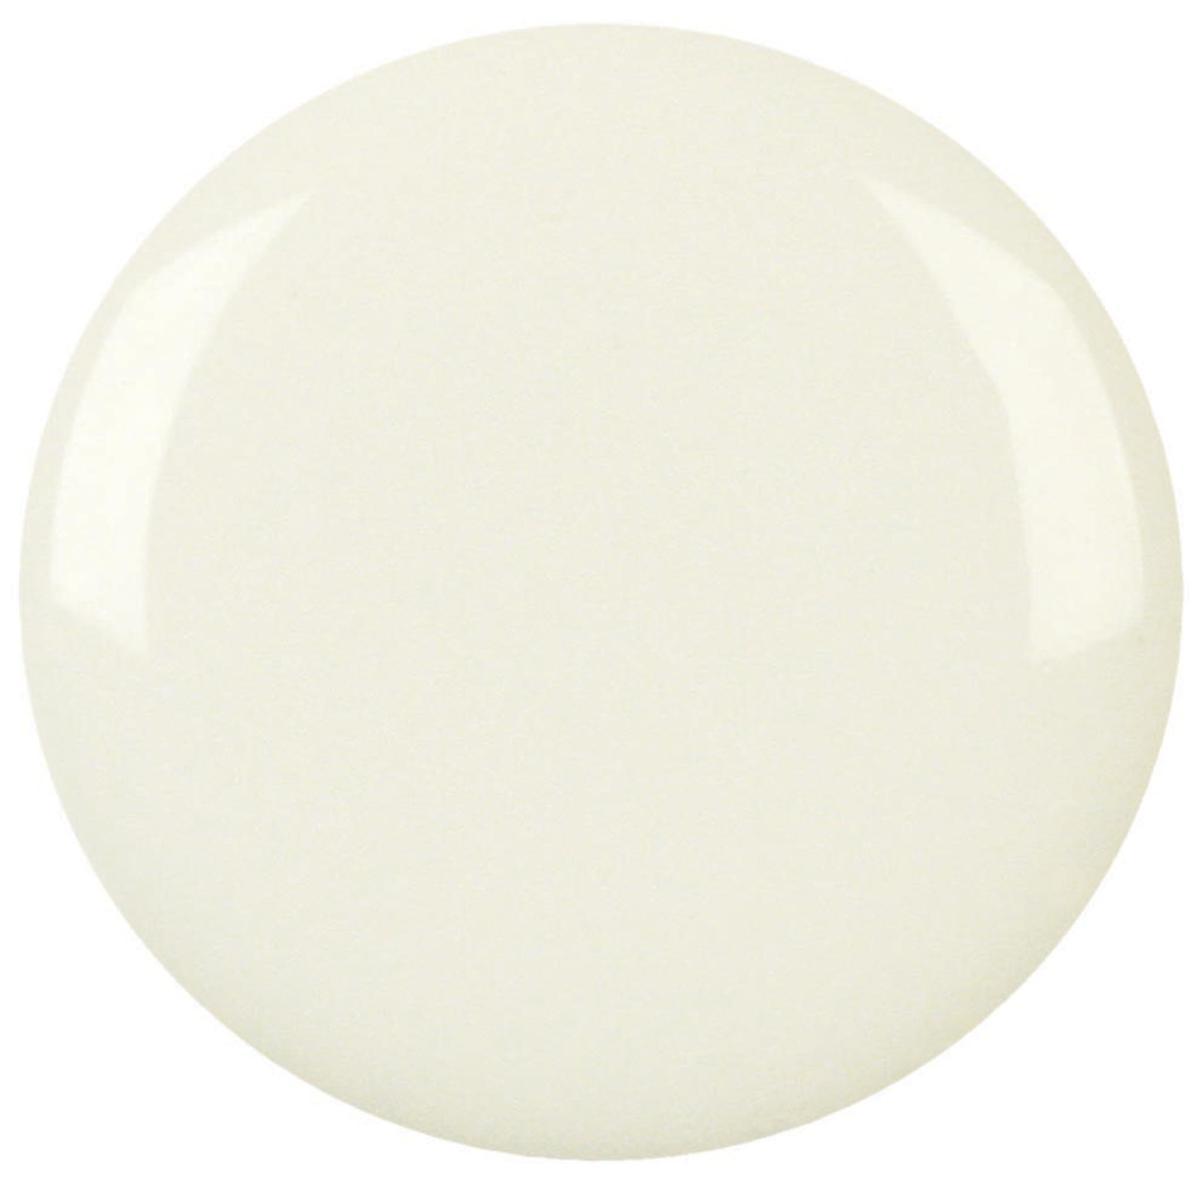 venta de esmalte para cerámica amaco teachers choice Tc-11 white baja temperatura